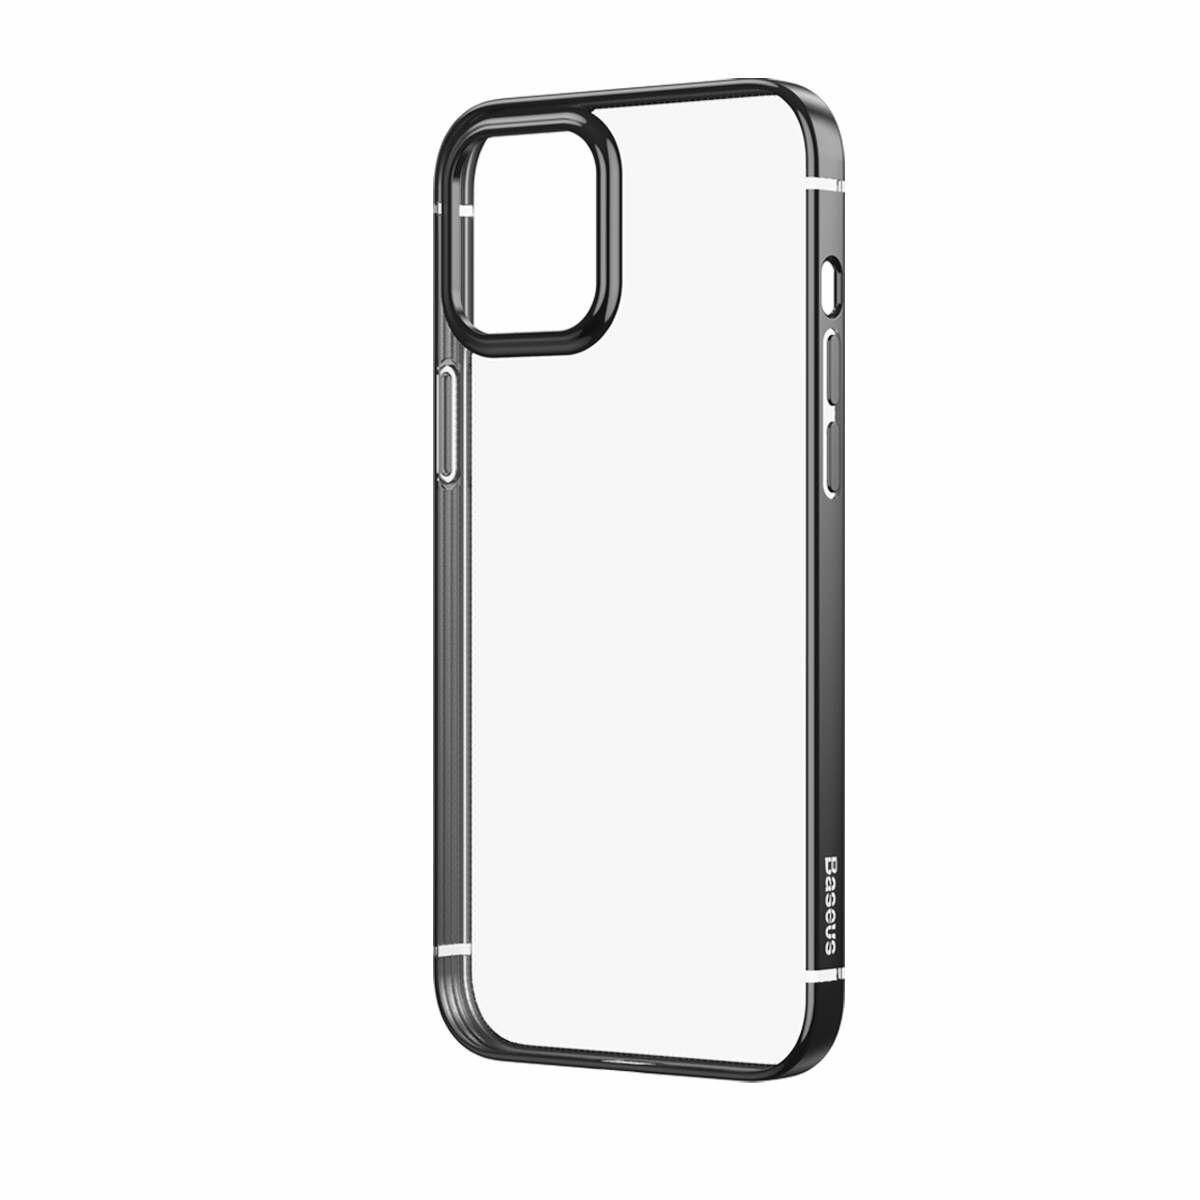 Baseus iPhone 12/12 Pro tok, Shining (esés védelemmel), fekete (ARAPIPH61P-MD01)